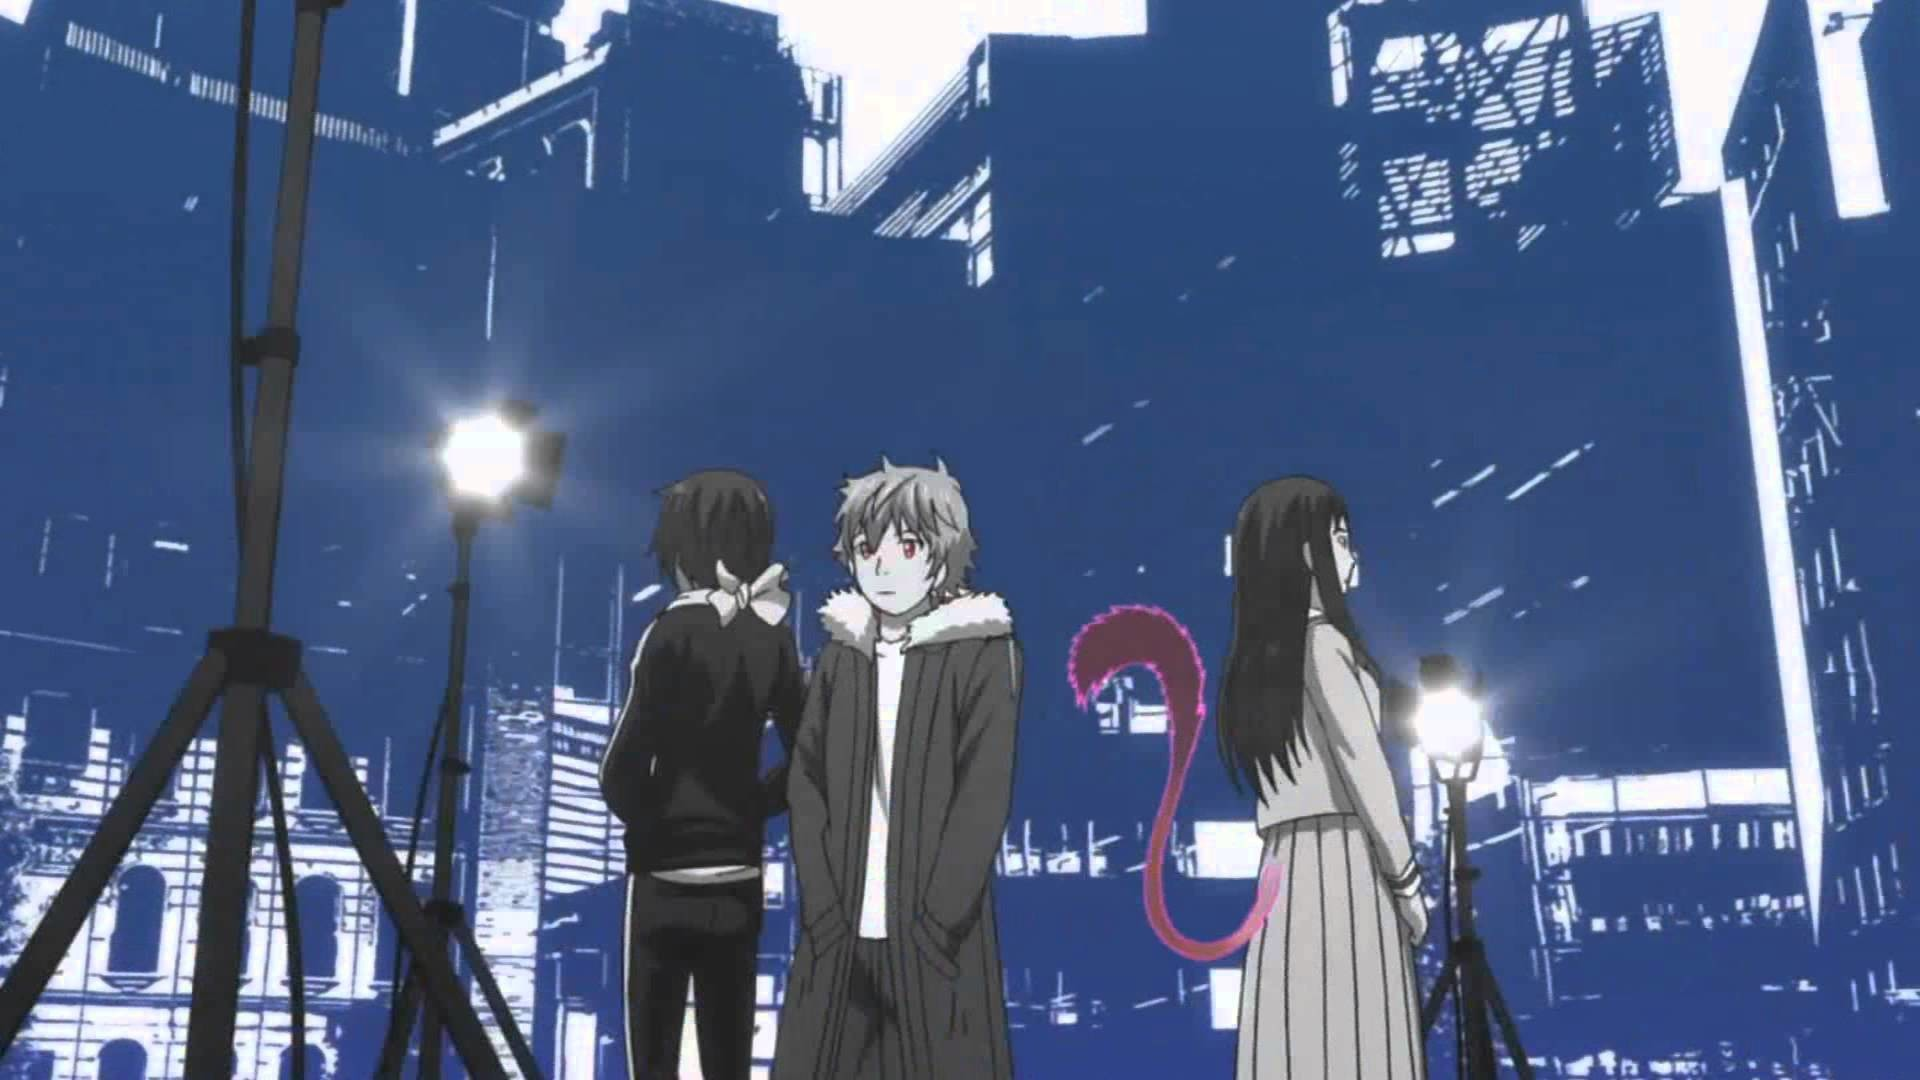 Anime – Noragami Yato (Noragami) Hiyori Iki Yukine (Noragami) Wallpaper